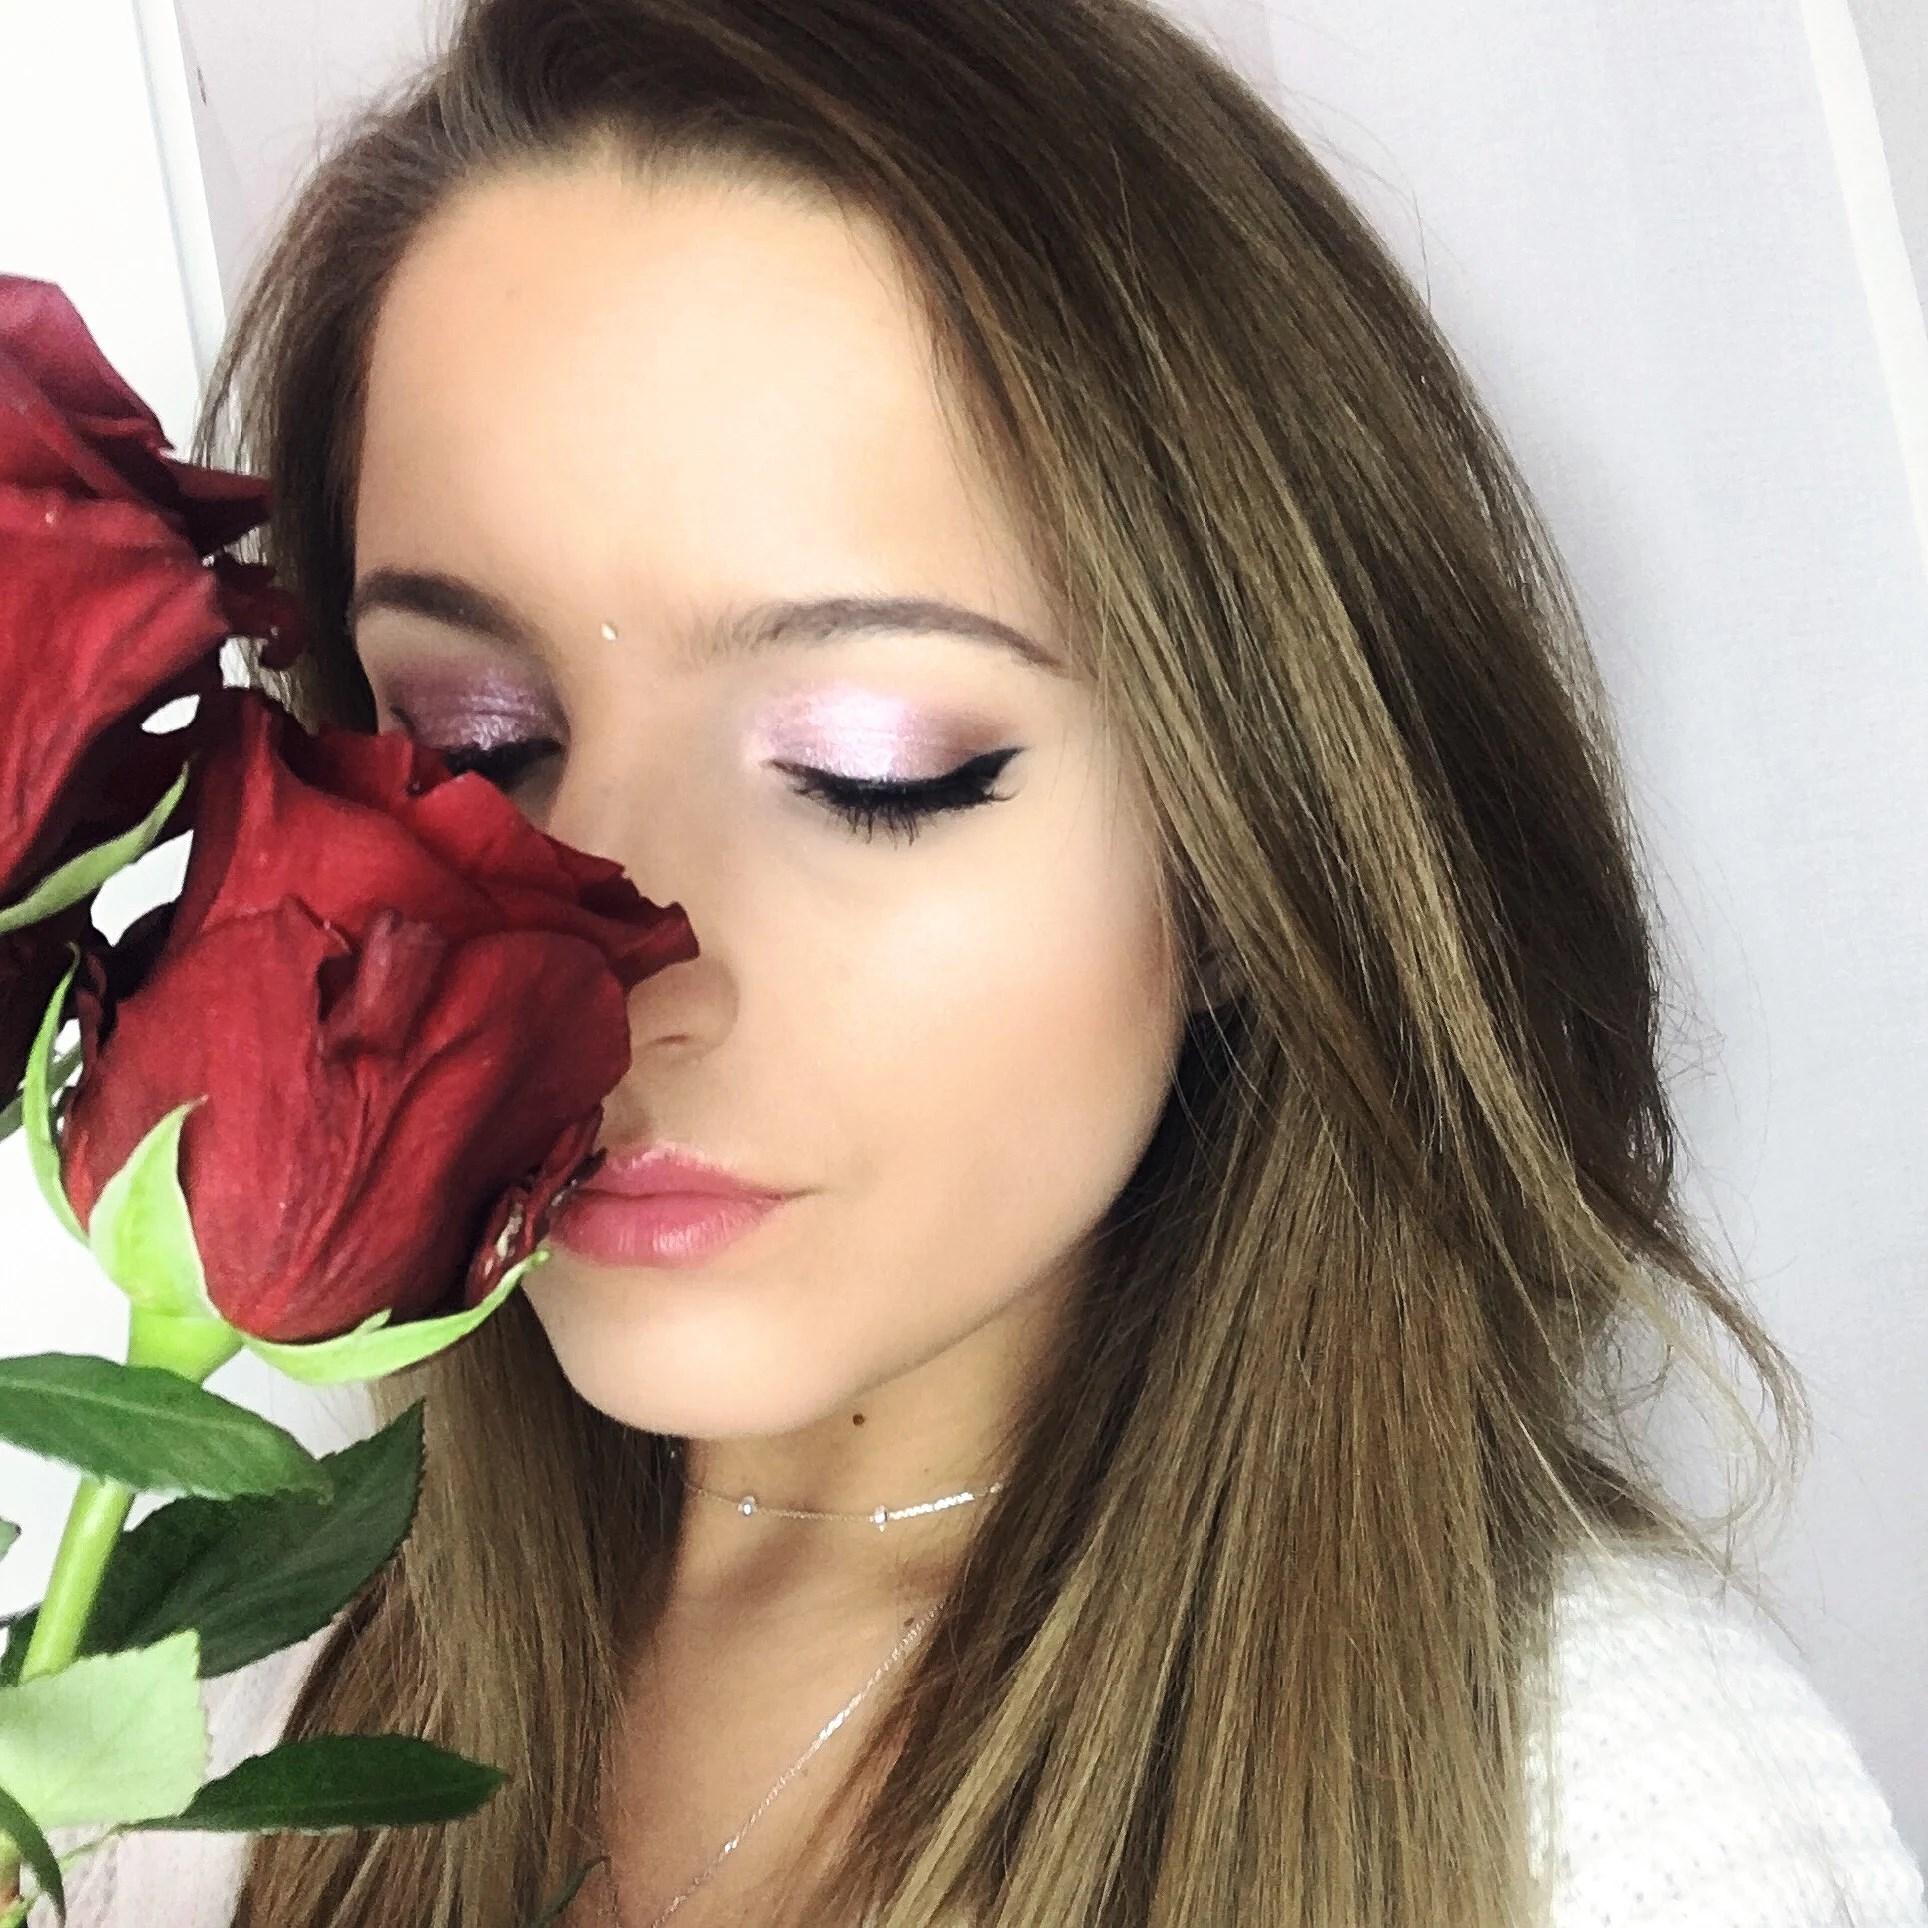 Fuller-Looking Lips